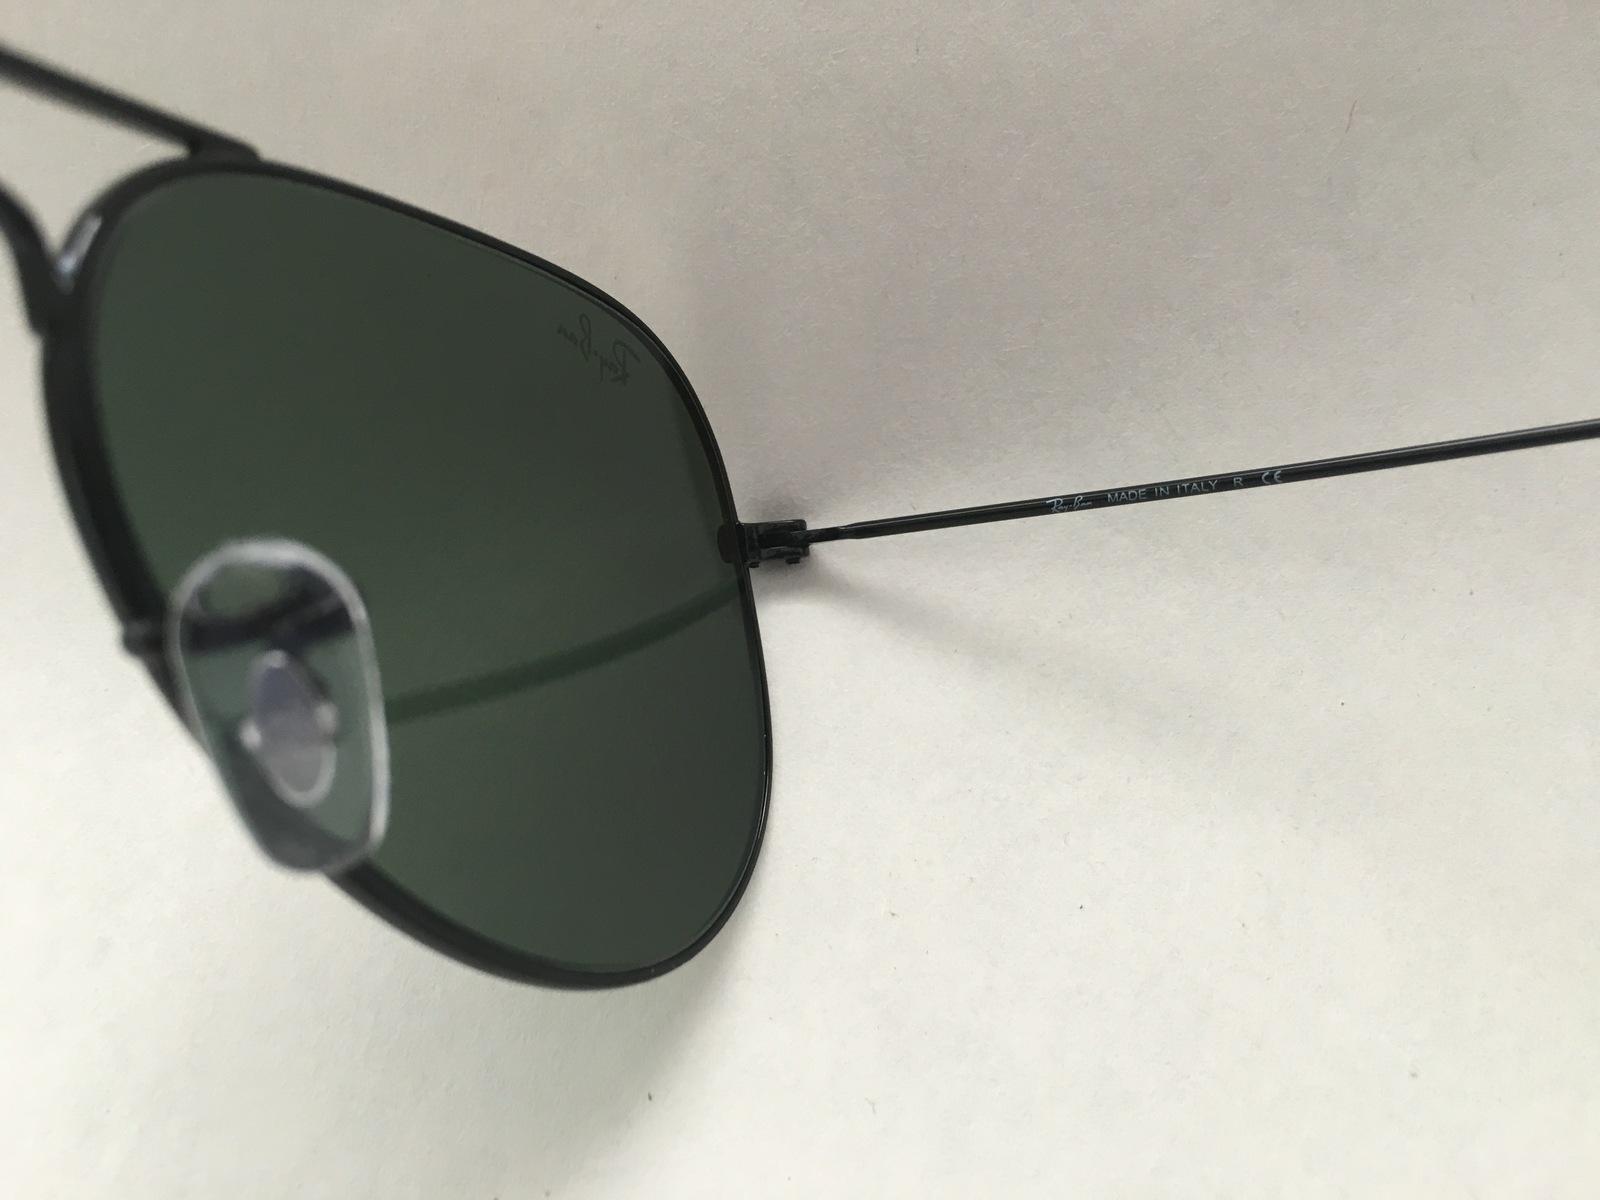 6226180d065 Ray-Ban Aviator RB3025 L2823 Black with Green G15 Lenses 58mm Sunglasses  100%UV